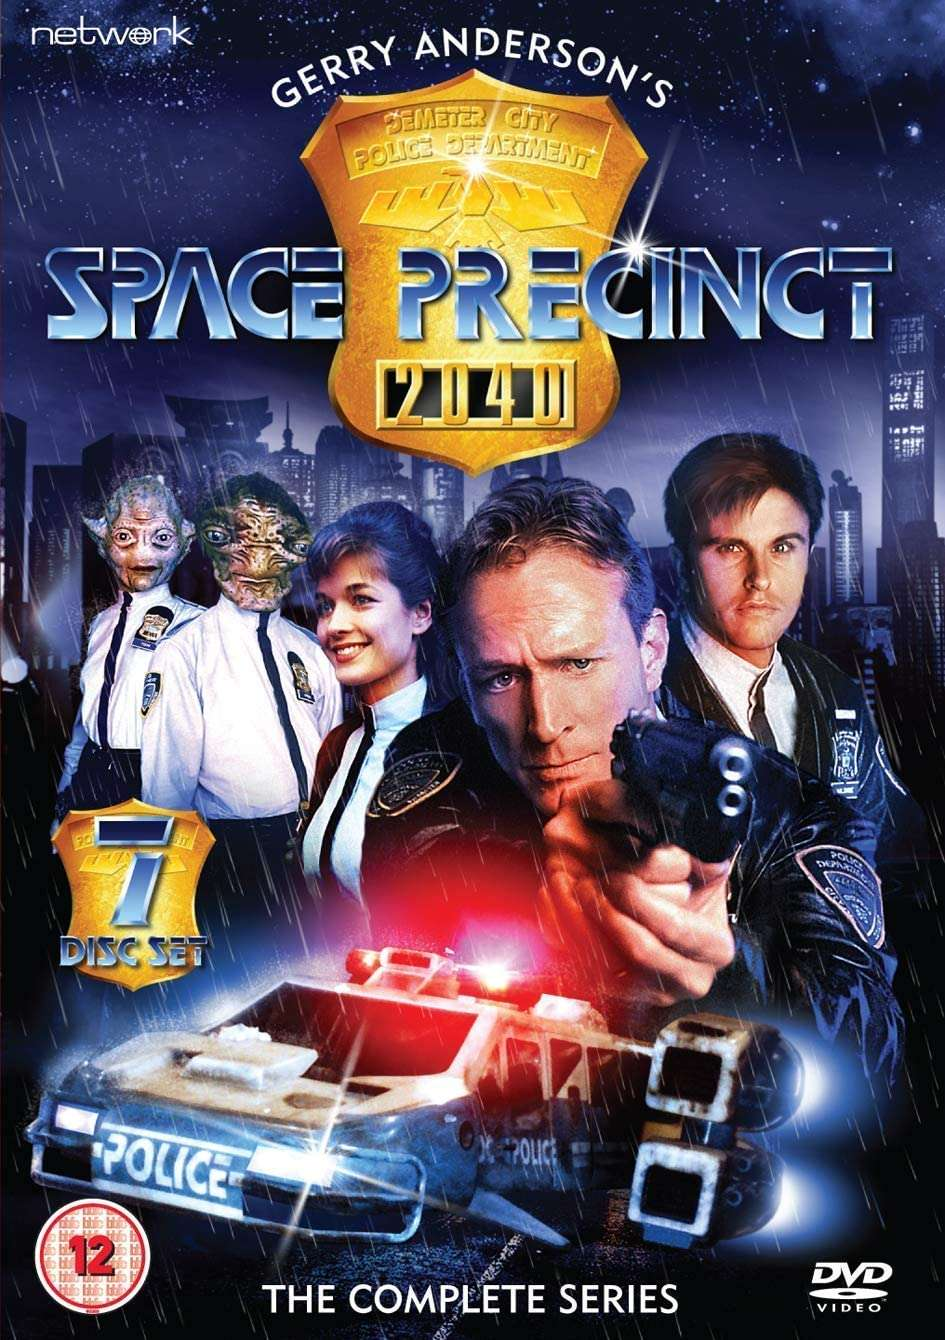 Space Precinct kapak